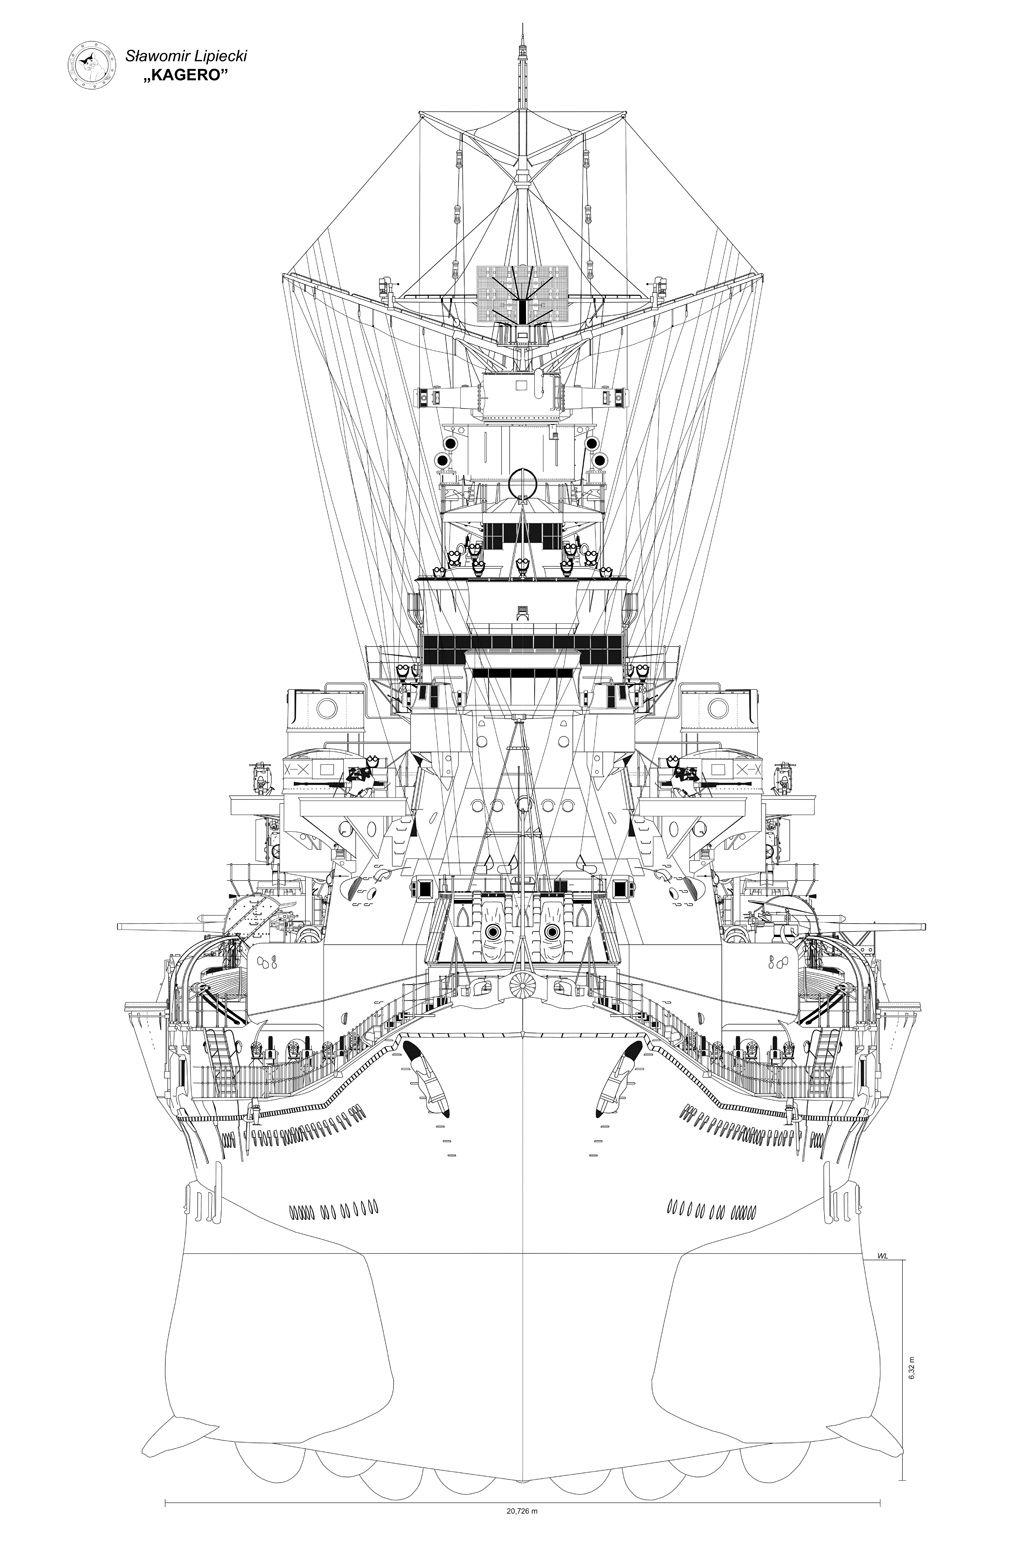 Crucero Takao 1932, visto de proa en 1945 | Military | Pinterest ...